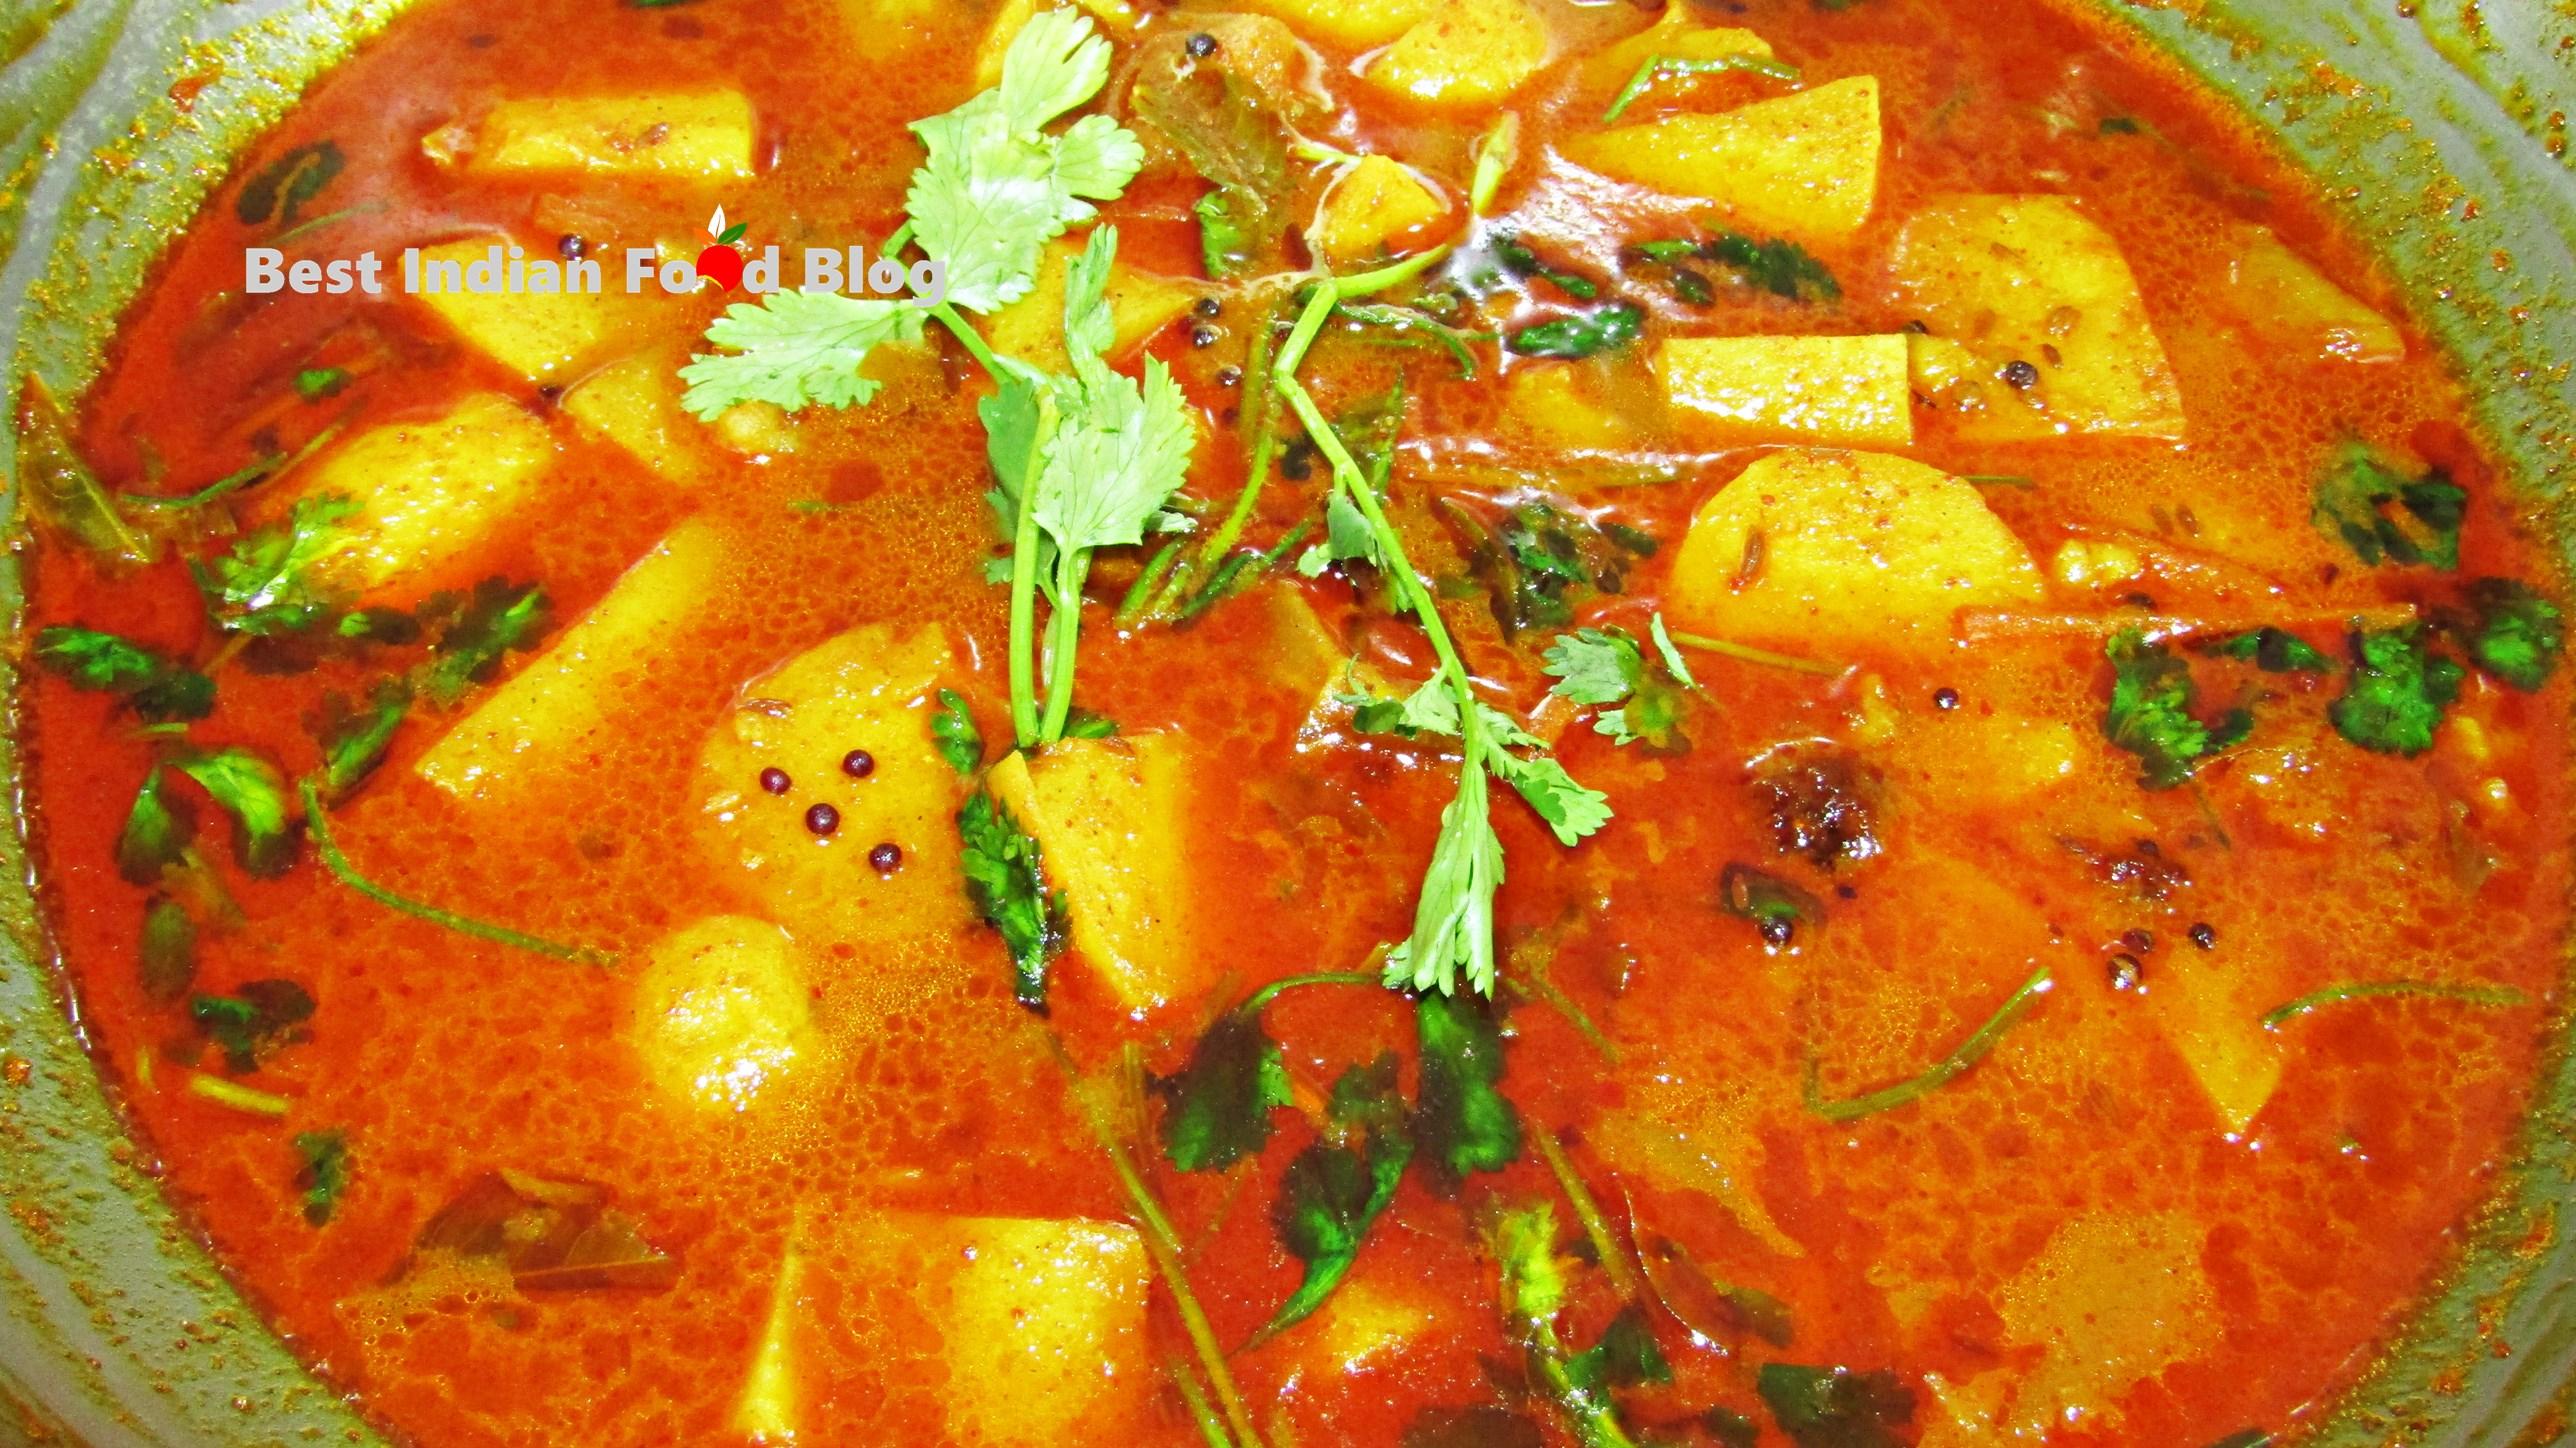 Bateta nu Shaak from Gujarat, India | Best Indian Food Blog | Potato recipe